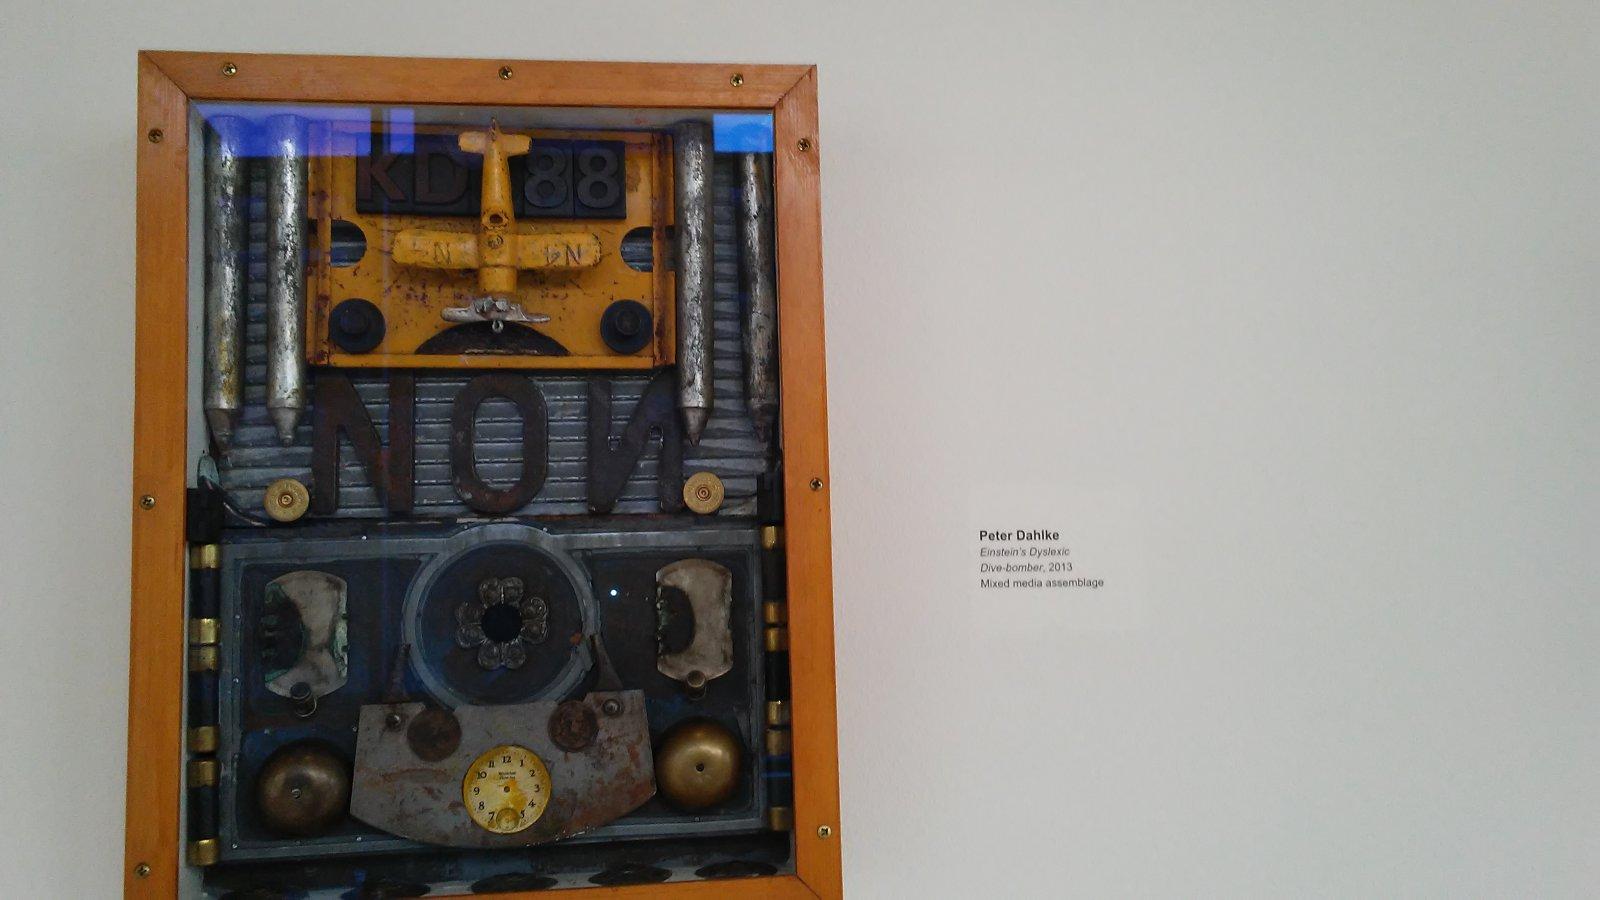 Einstein's Dyslexic Dive-bomber by Peter Dahlke